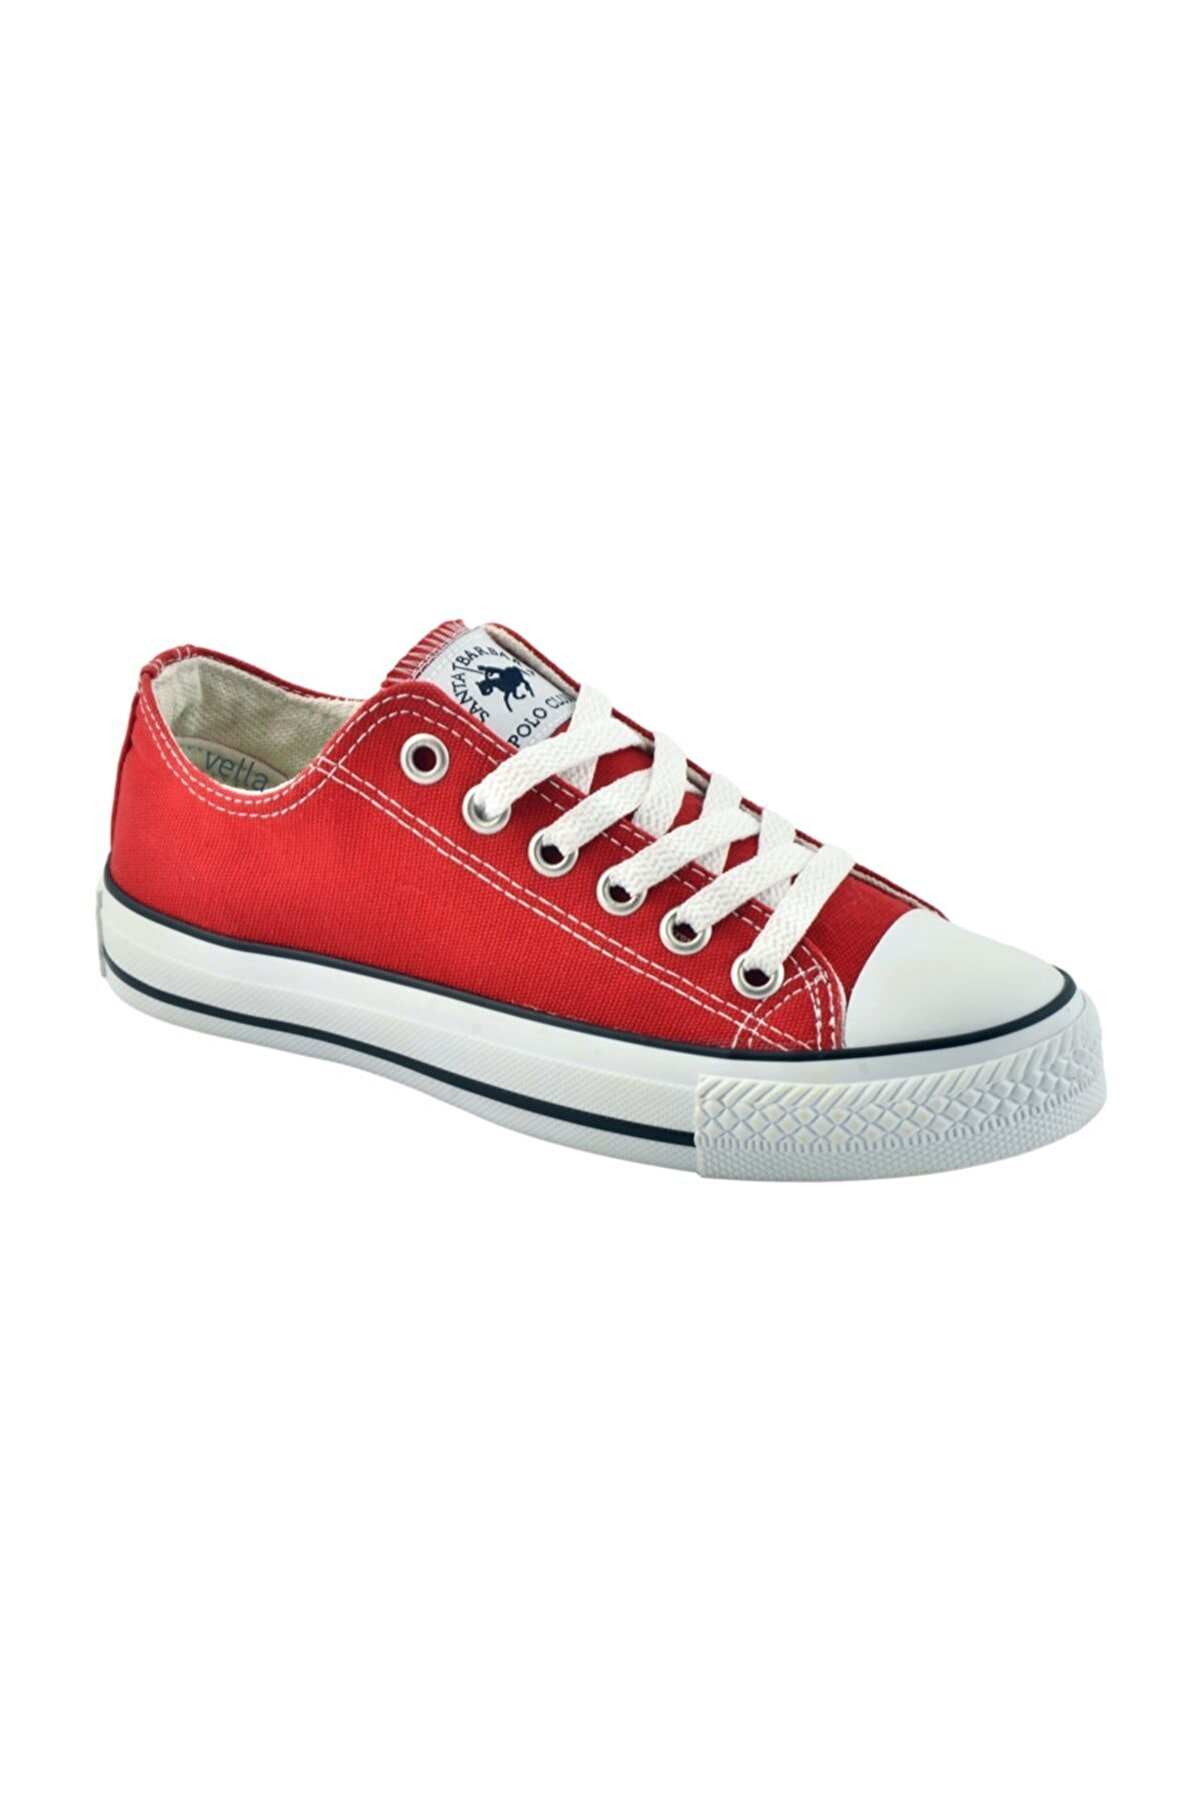 SANTA BARBARA POLO Club Converse Ayakkabı Kırmızı Spc-01